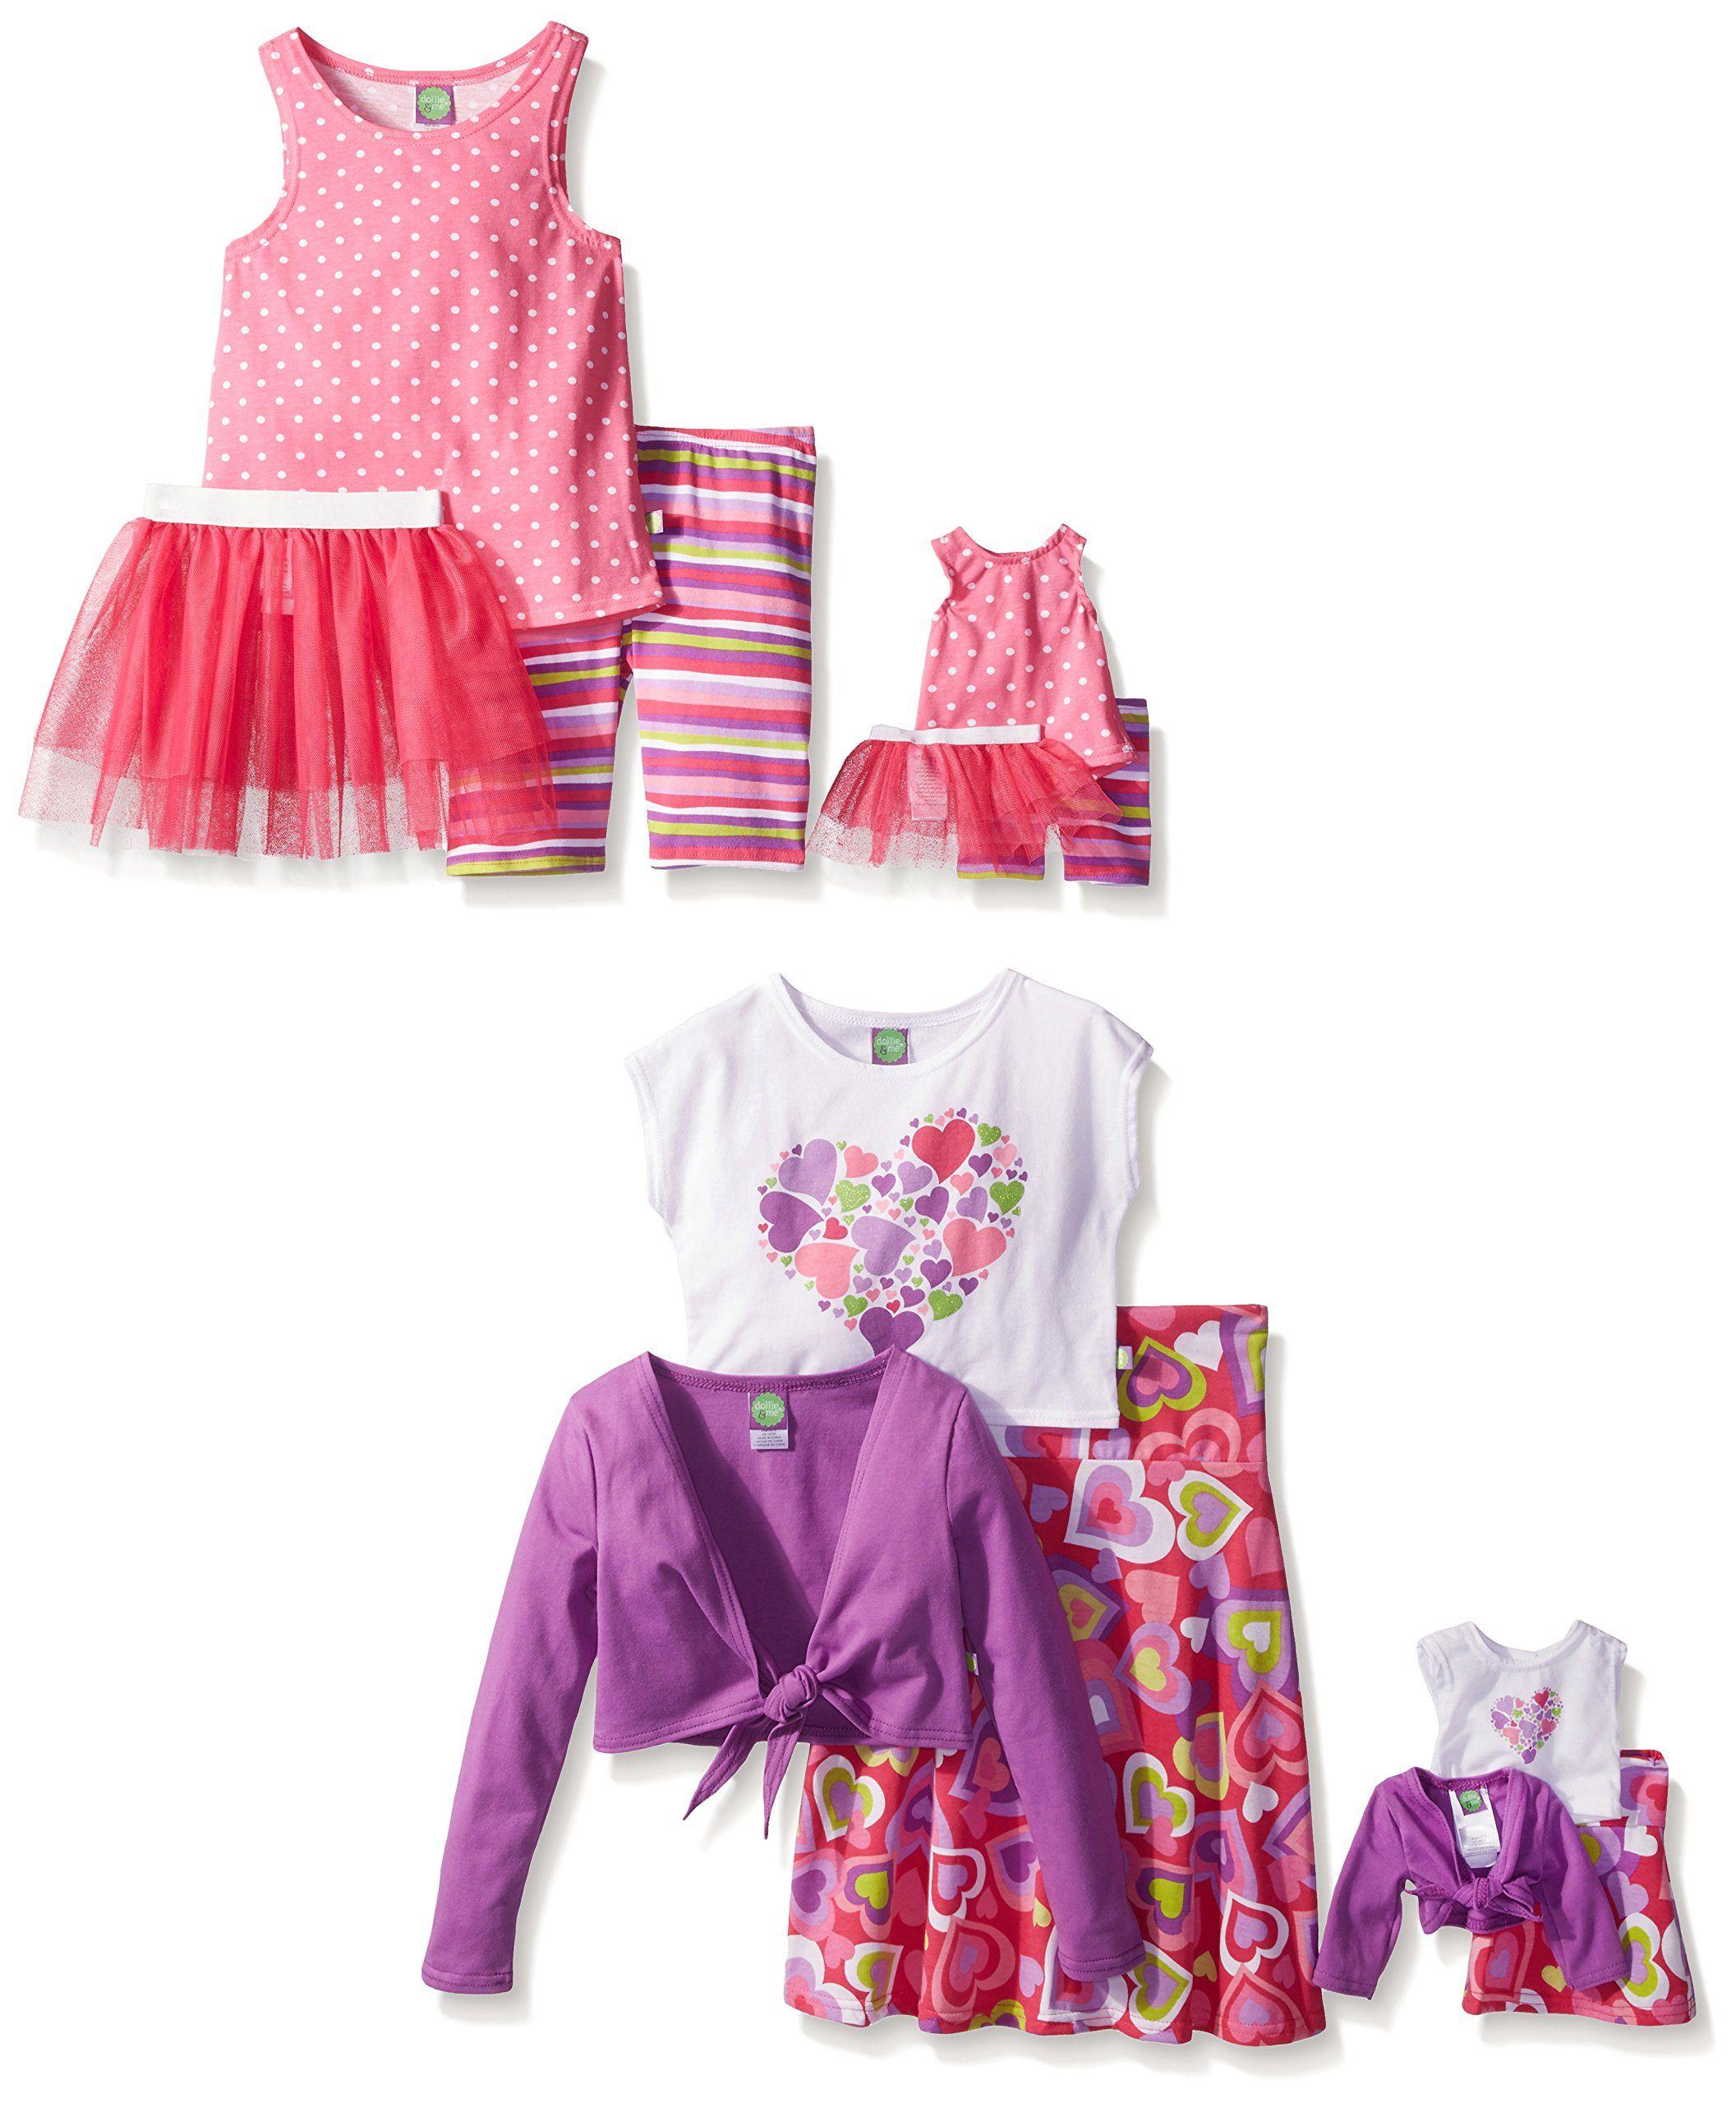 a46d5f8665 Dollie   Me Little Girls  Pink Hearts Fashion Mix-Ups Multi Piece ...